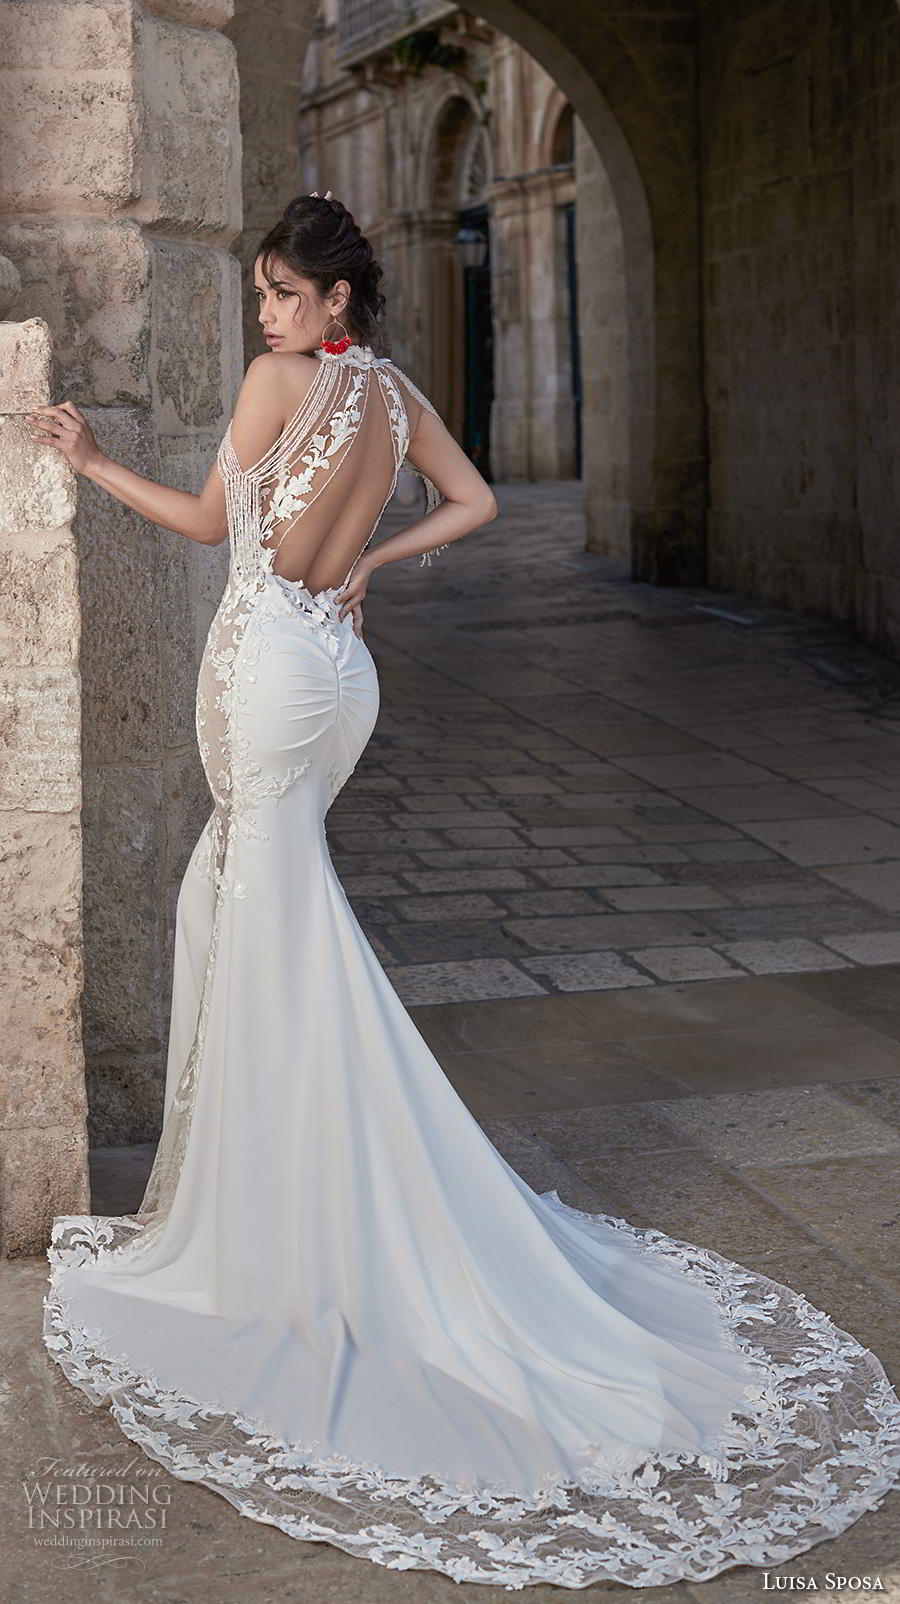 luisa sposa 2020 bridal cold shoulder sweetheart neckline light embellishment elegant glamorous fit and flare wedding dress backless low back chapel train (11) bv